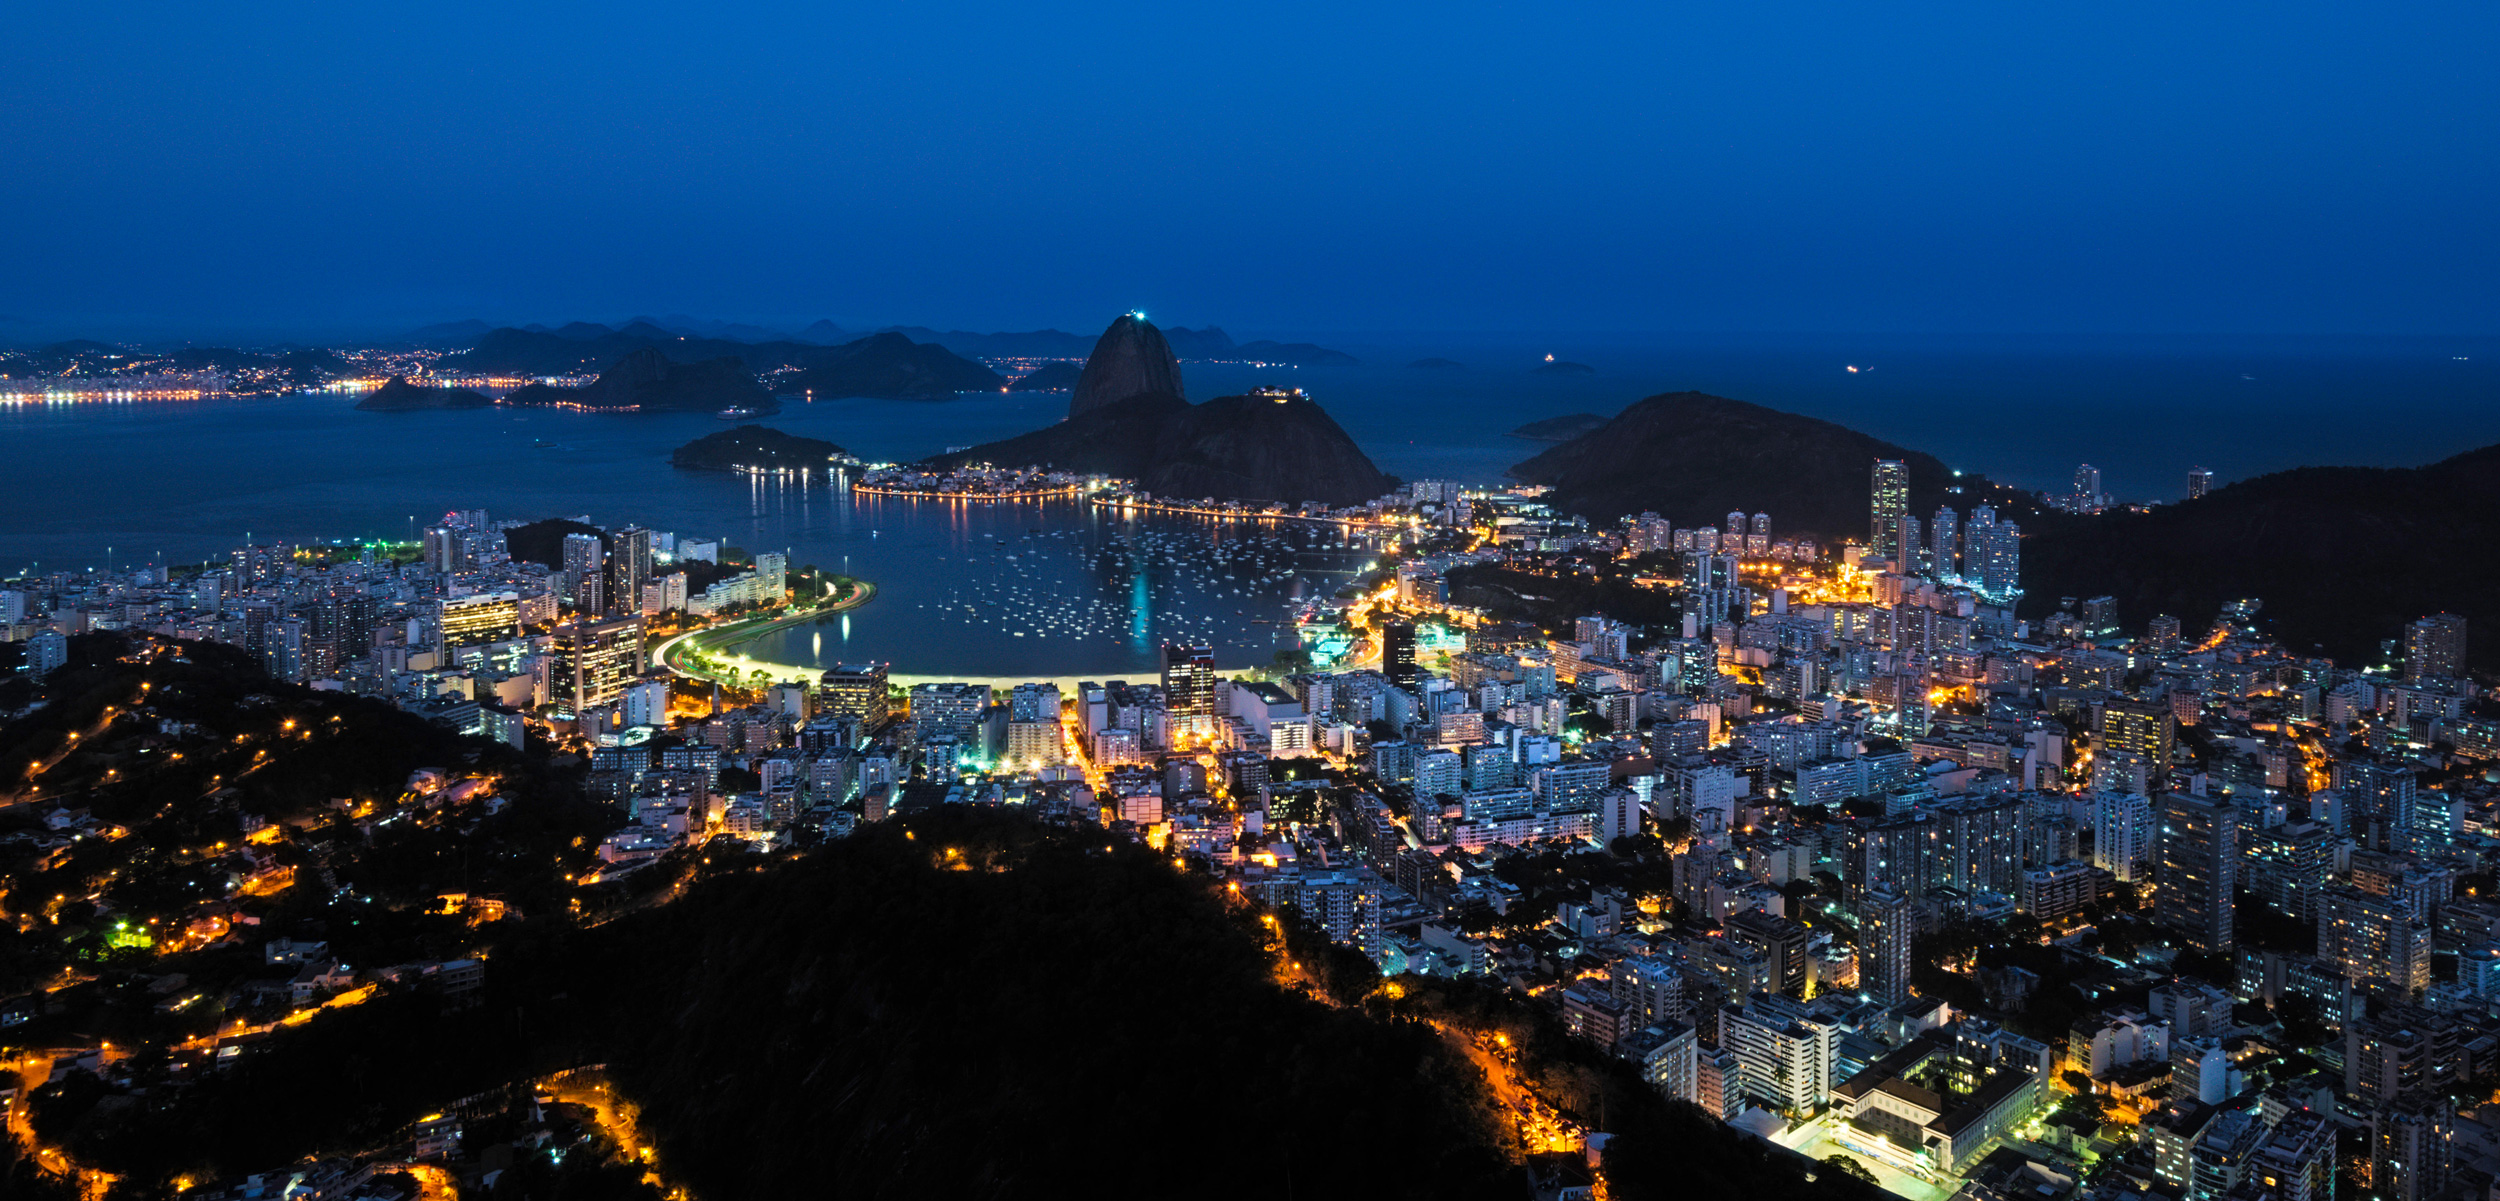 Rio de Janeiro, Brazil at night